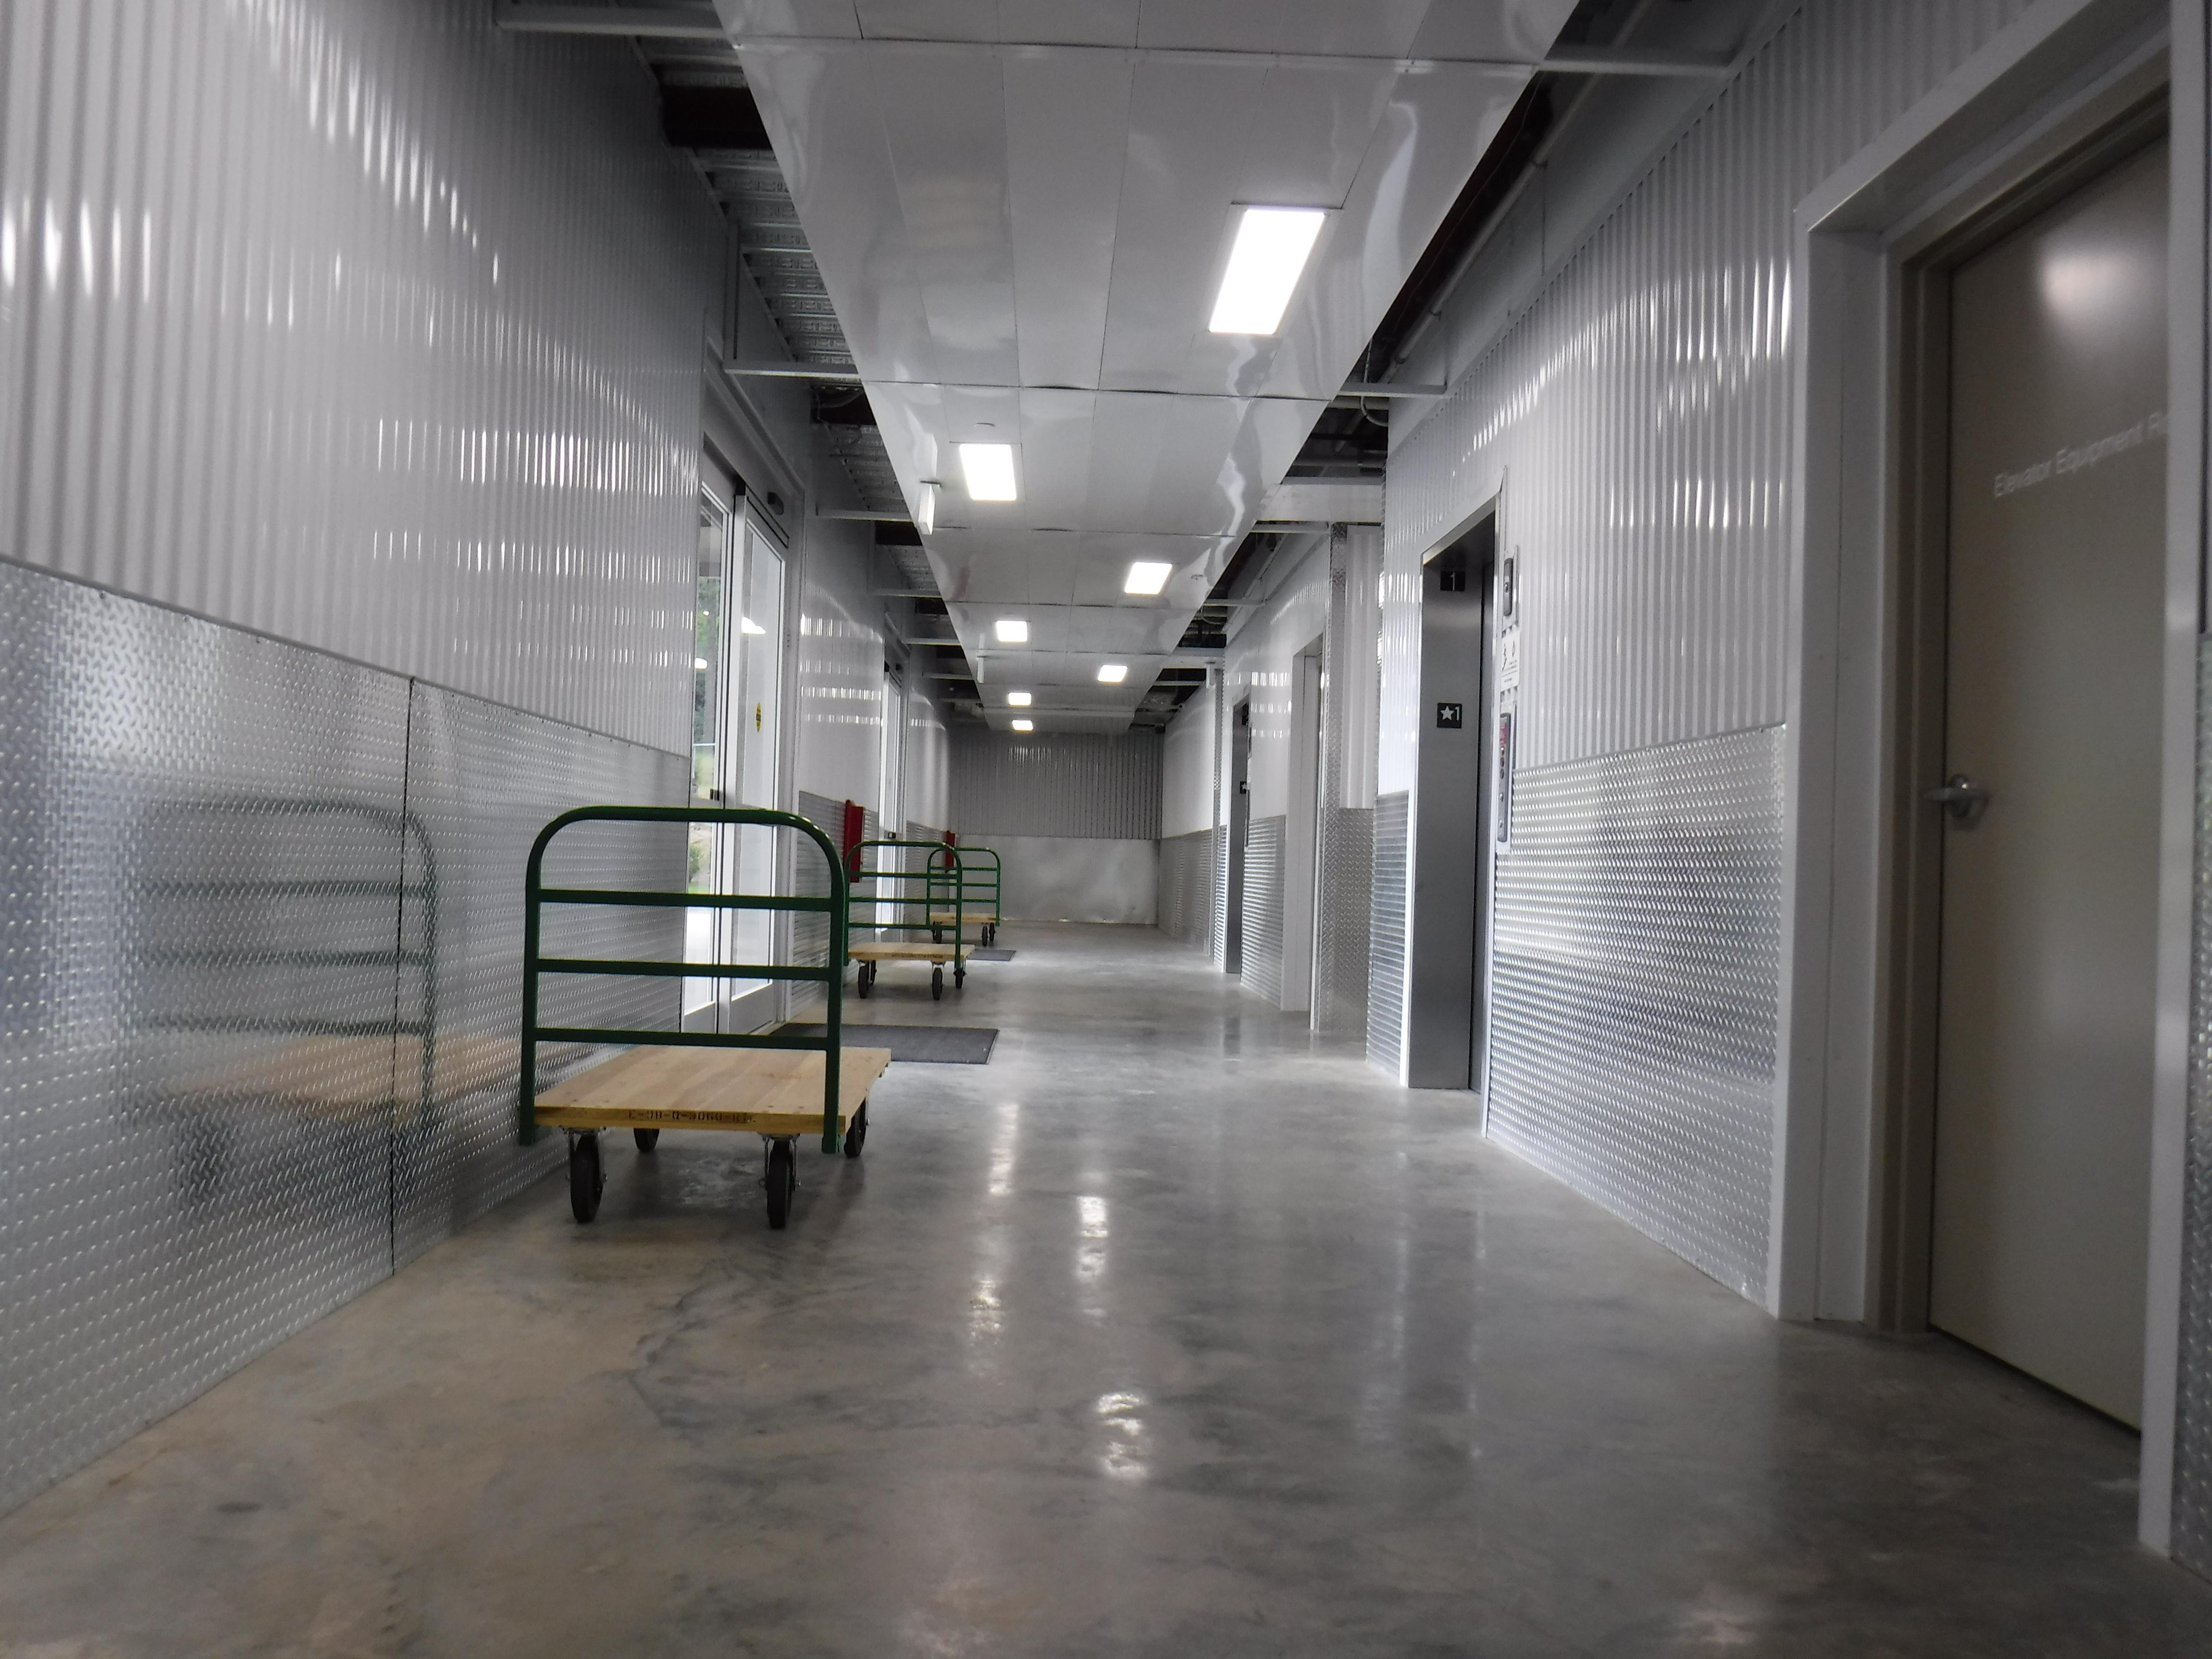 Elevator Access Self Storage in Birmingham, AL